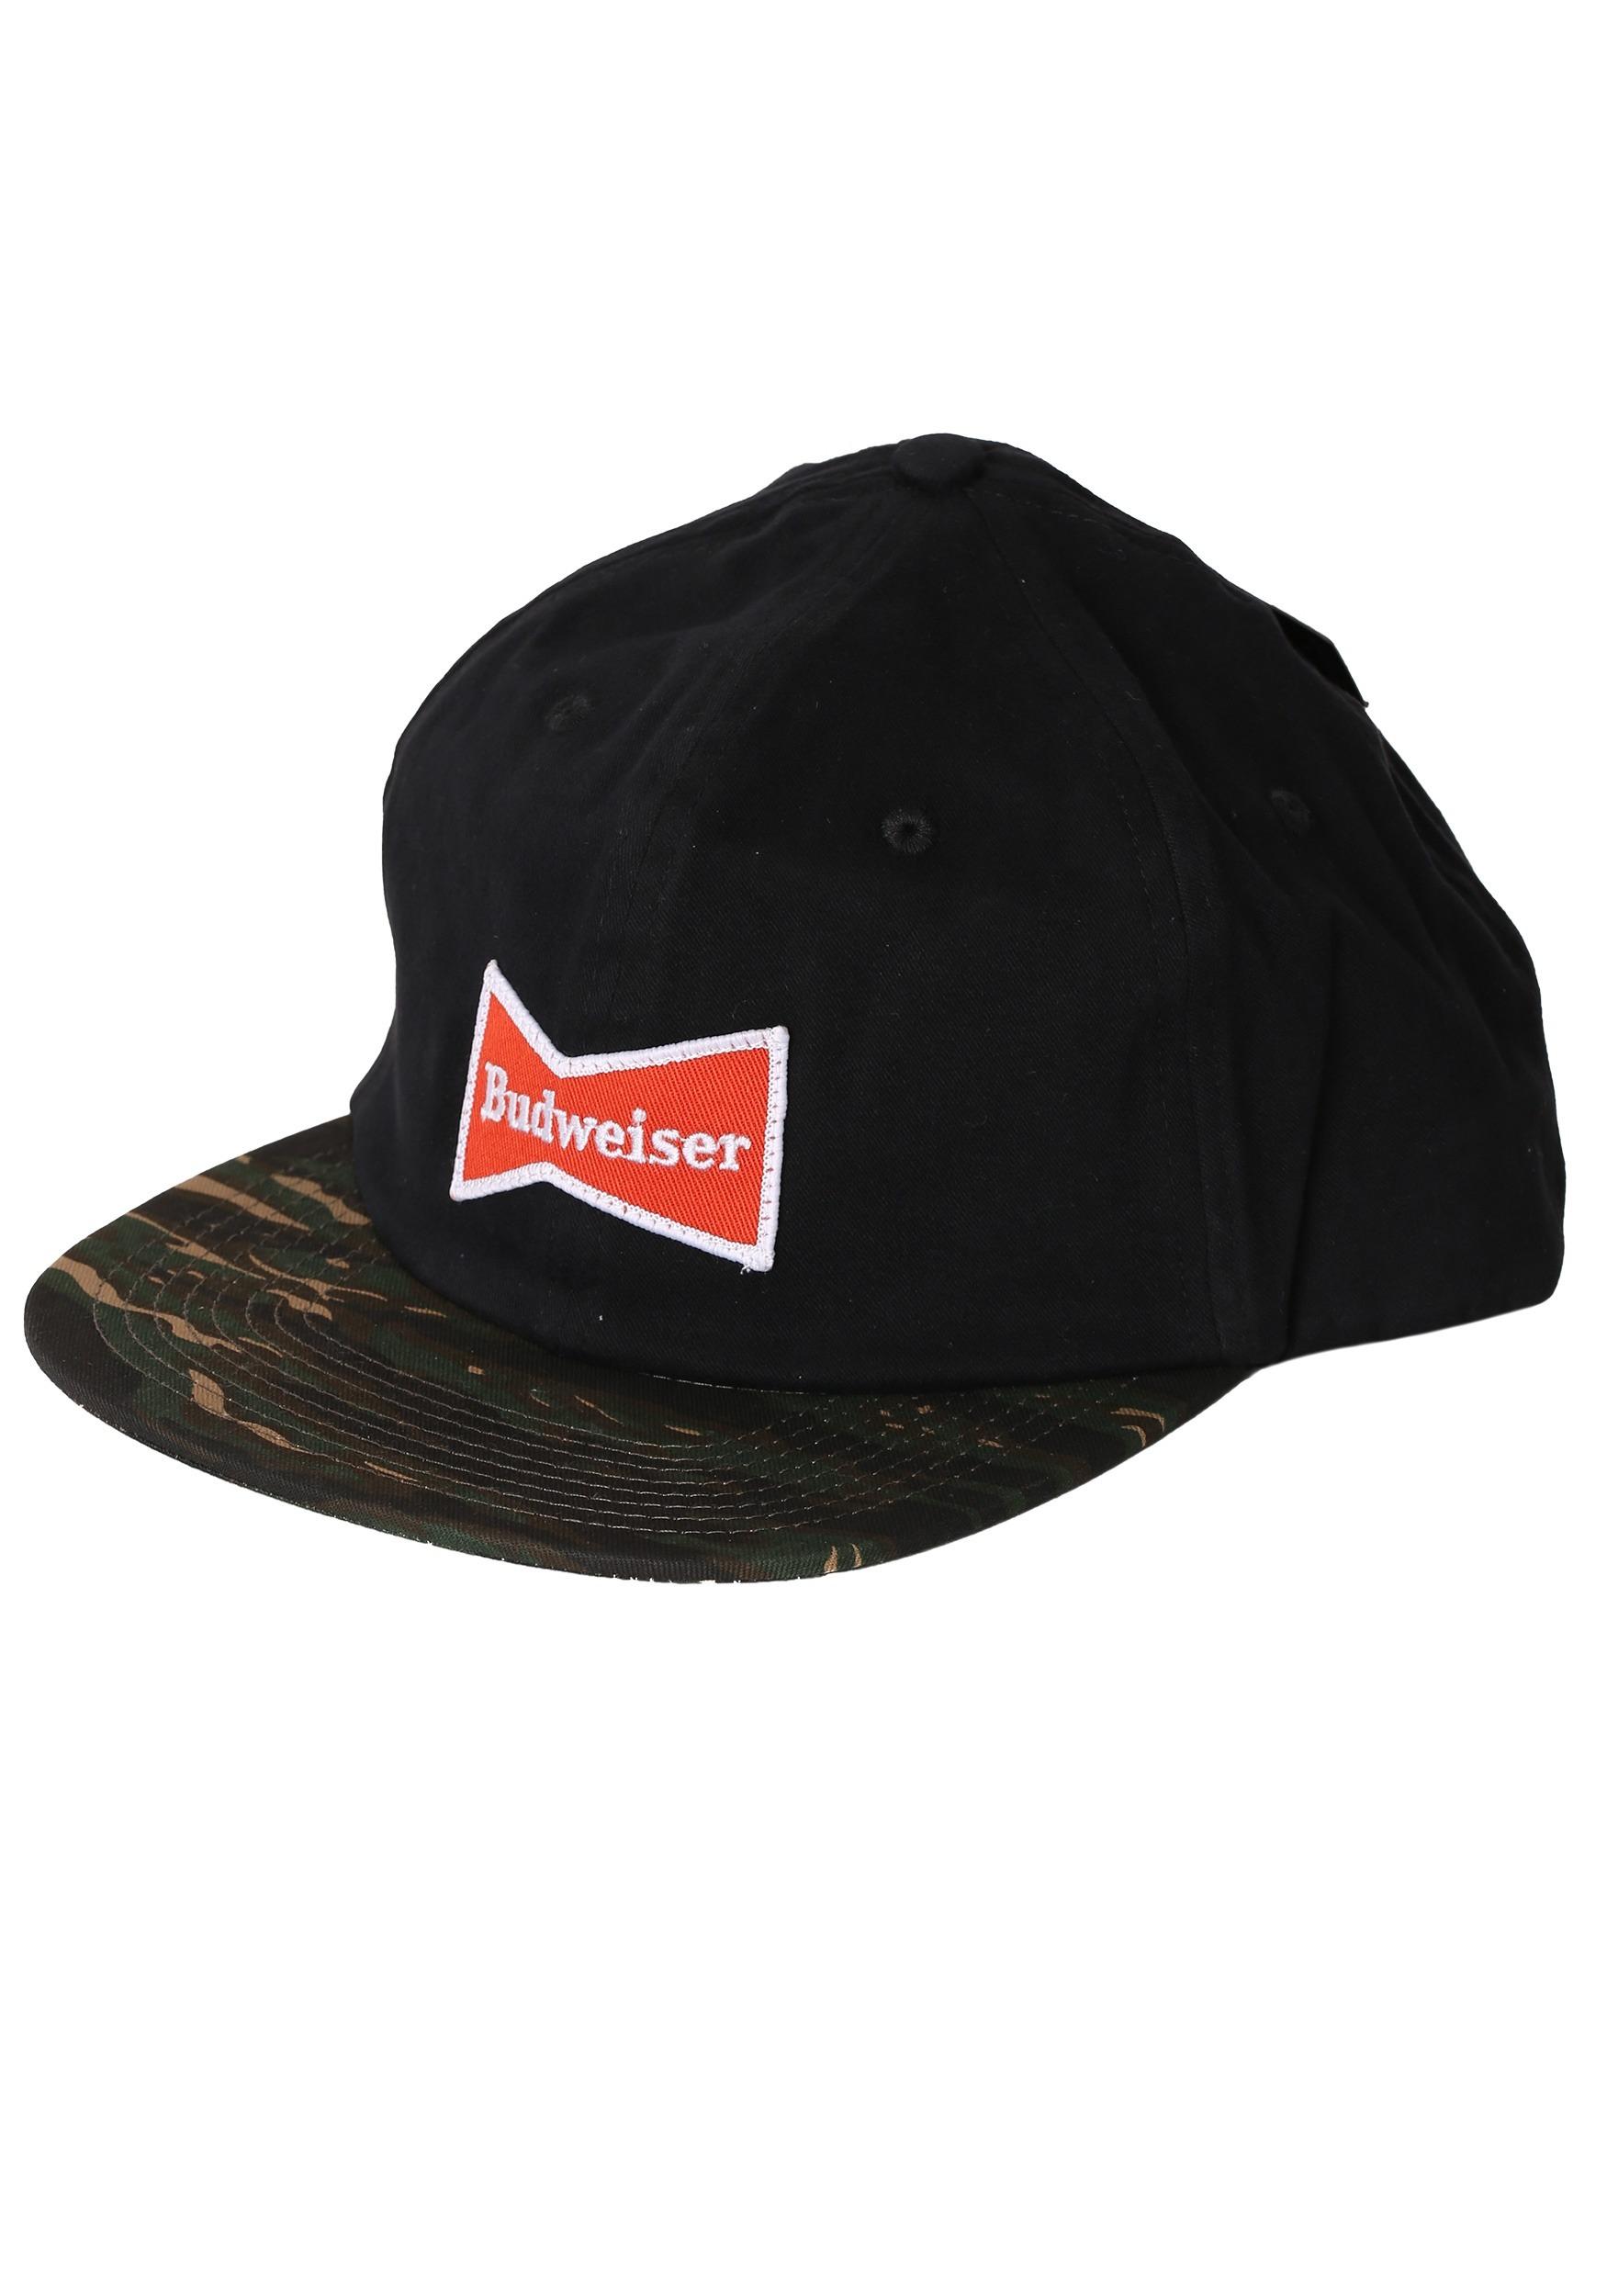 Budweiser Bowtie Black and Camo Baseball Hat HSGSABJ-100074